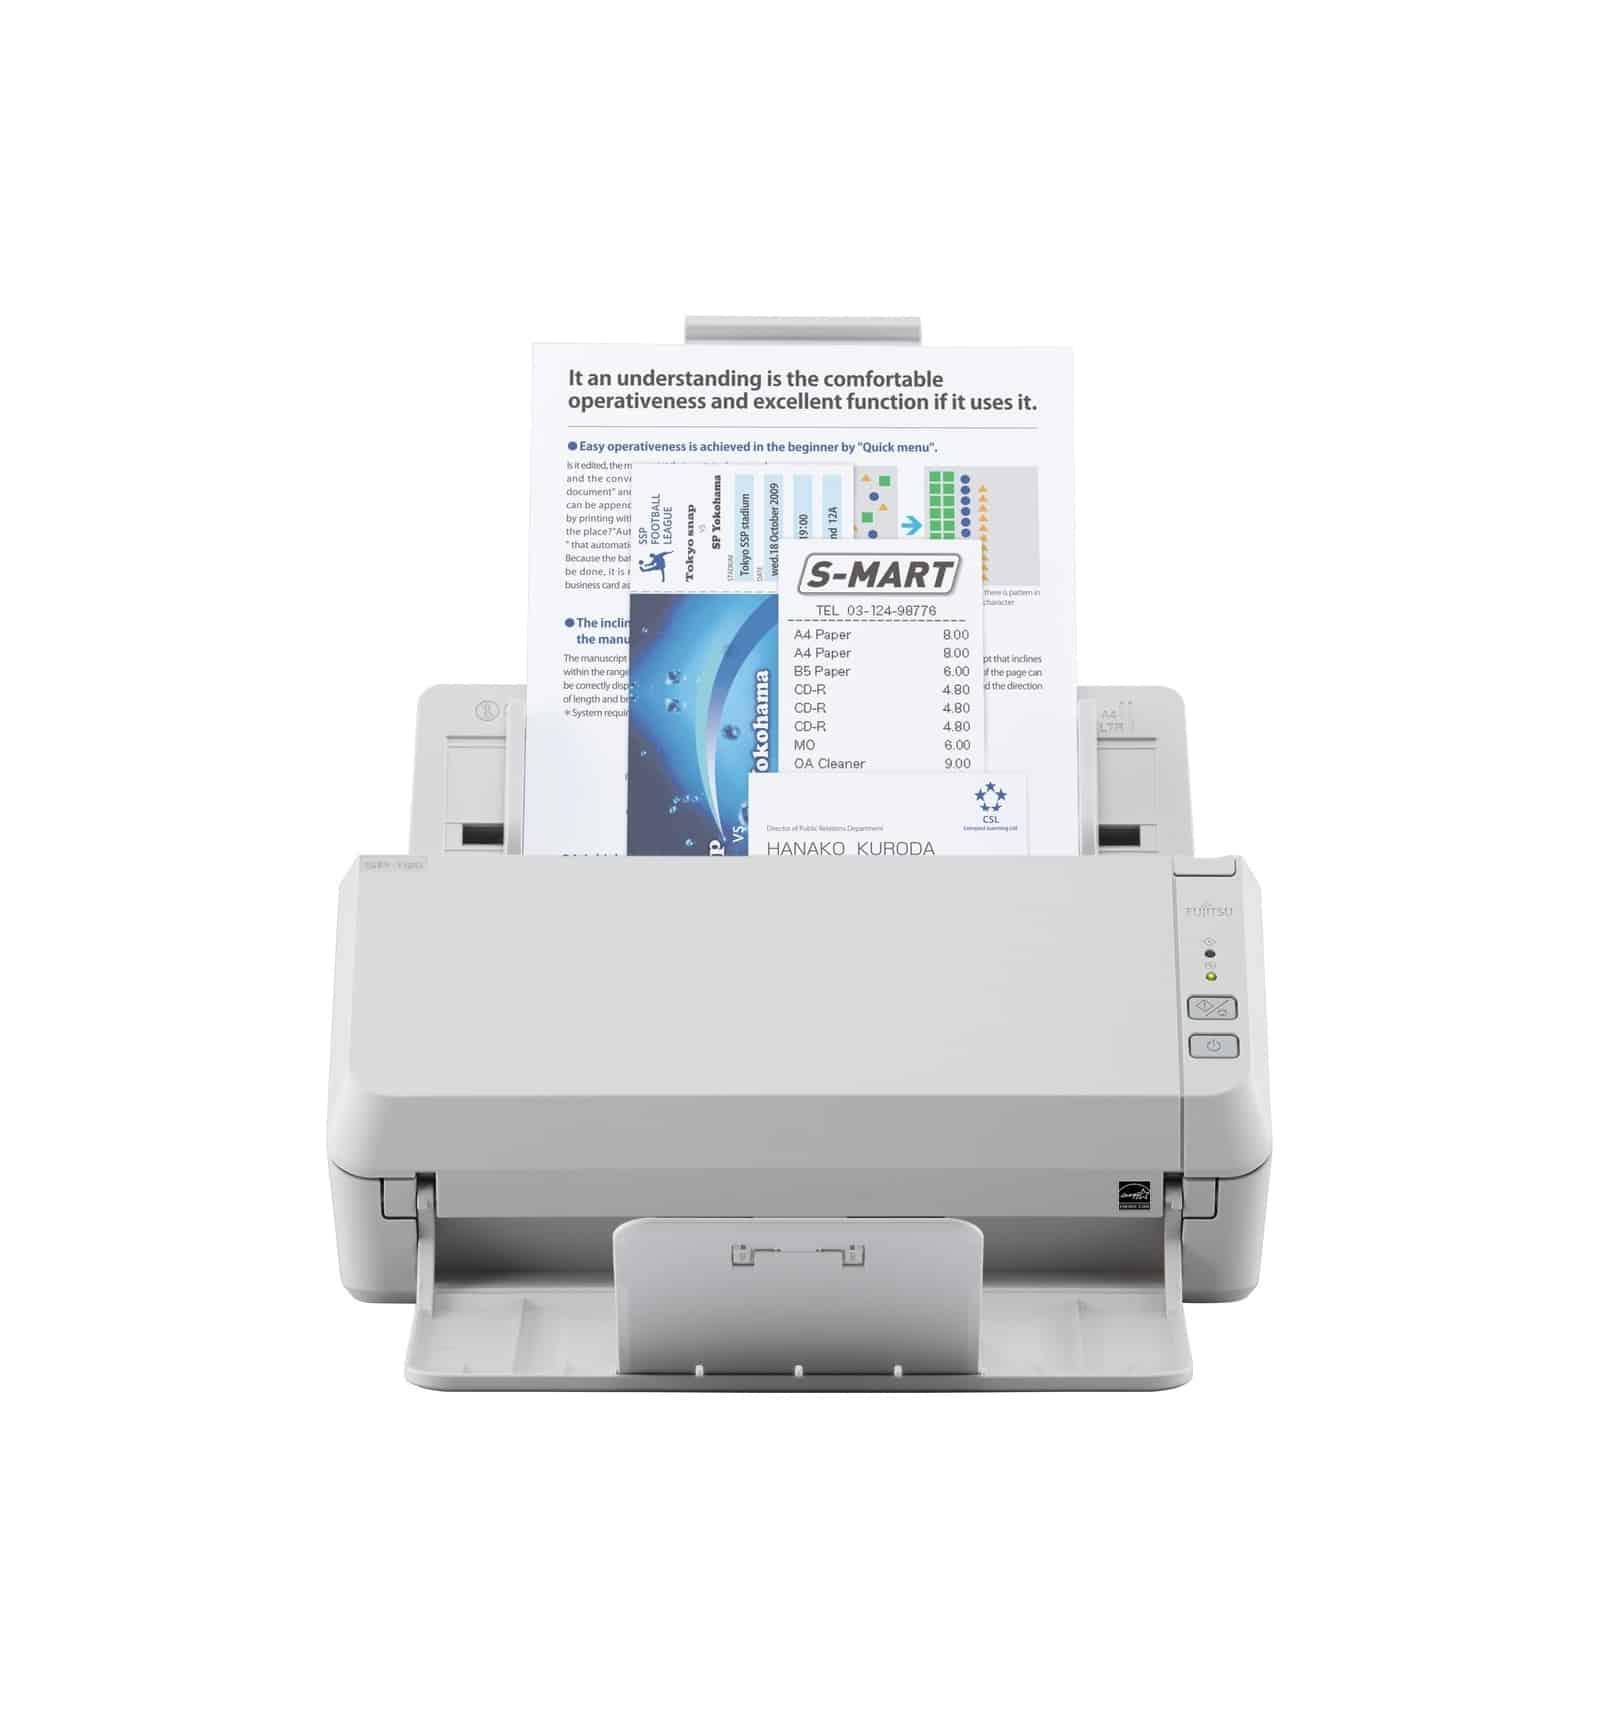 Fujitsu Image Scanner SP-1120